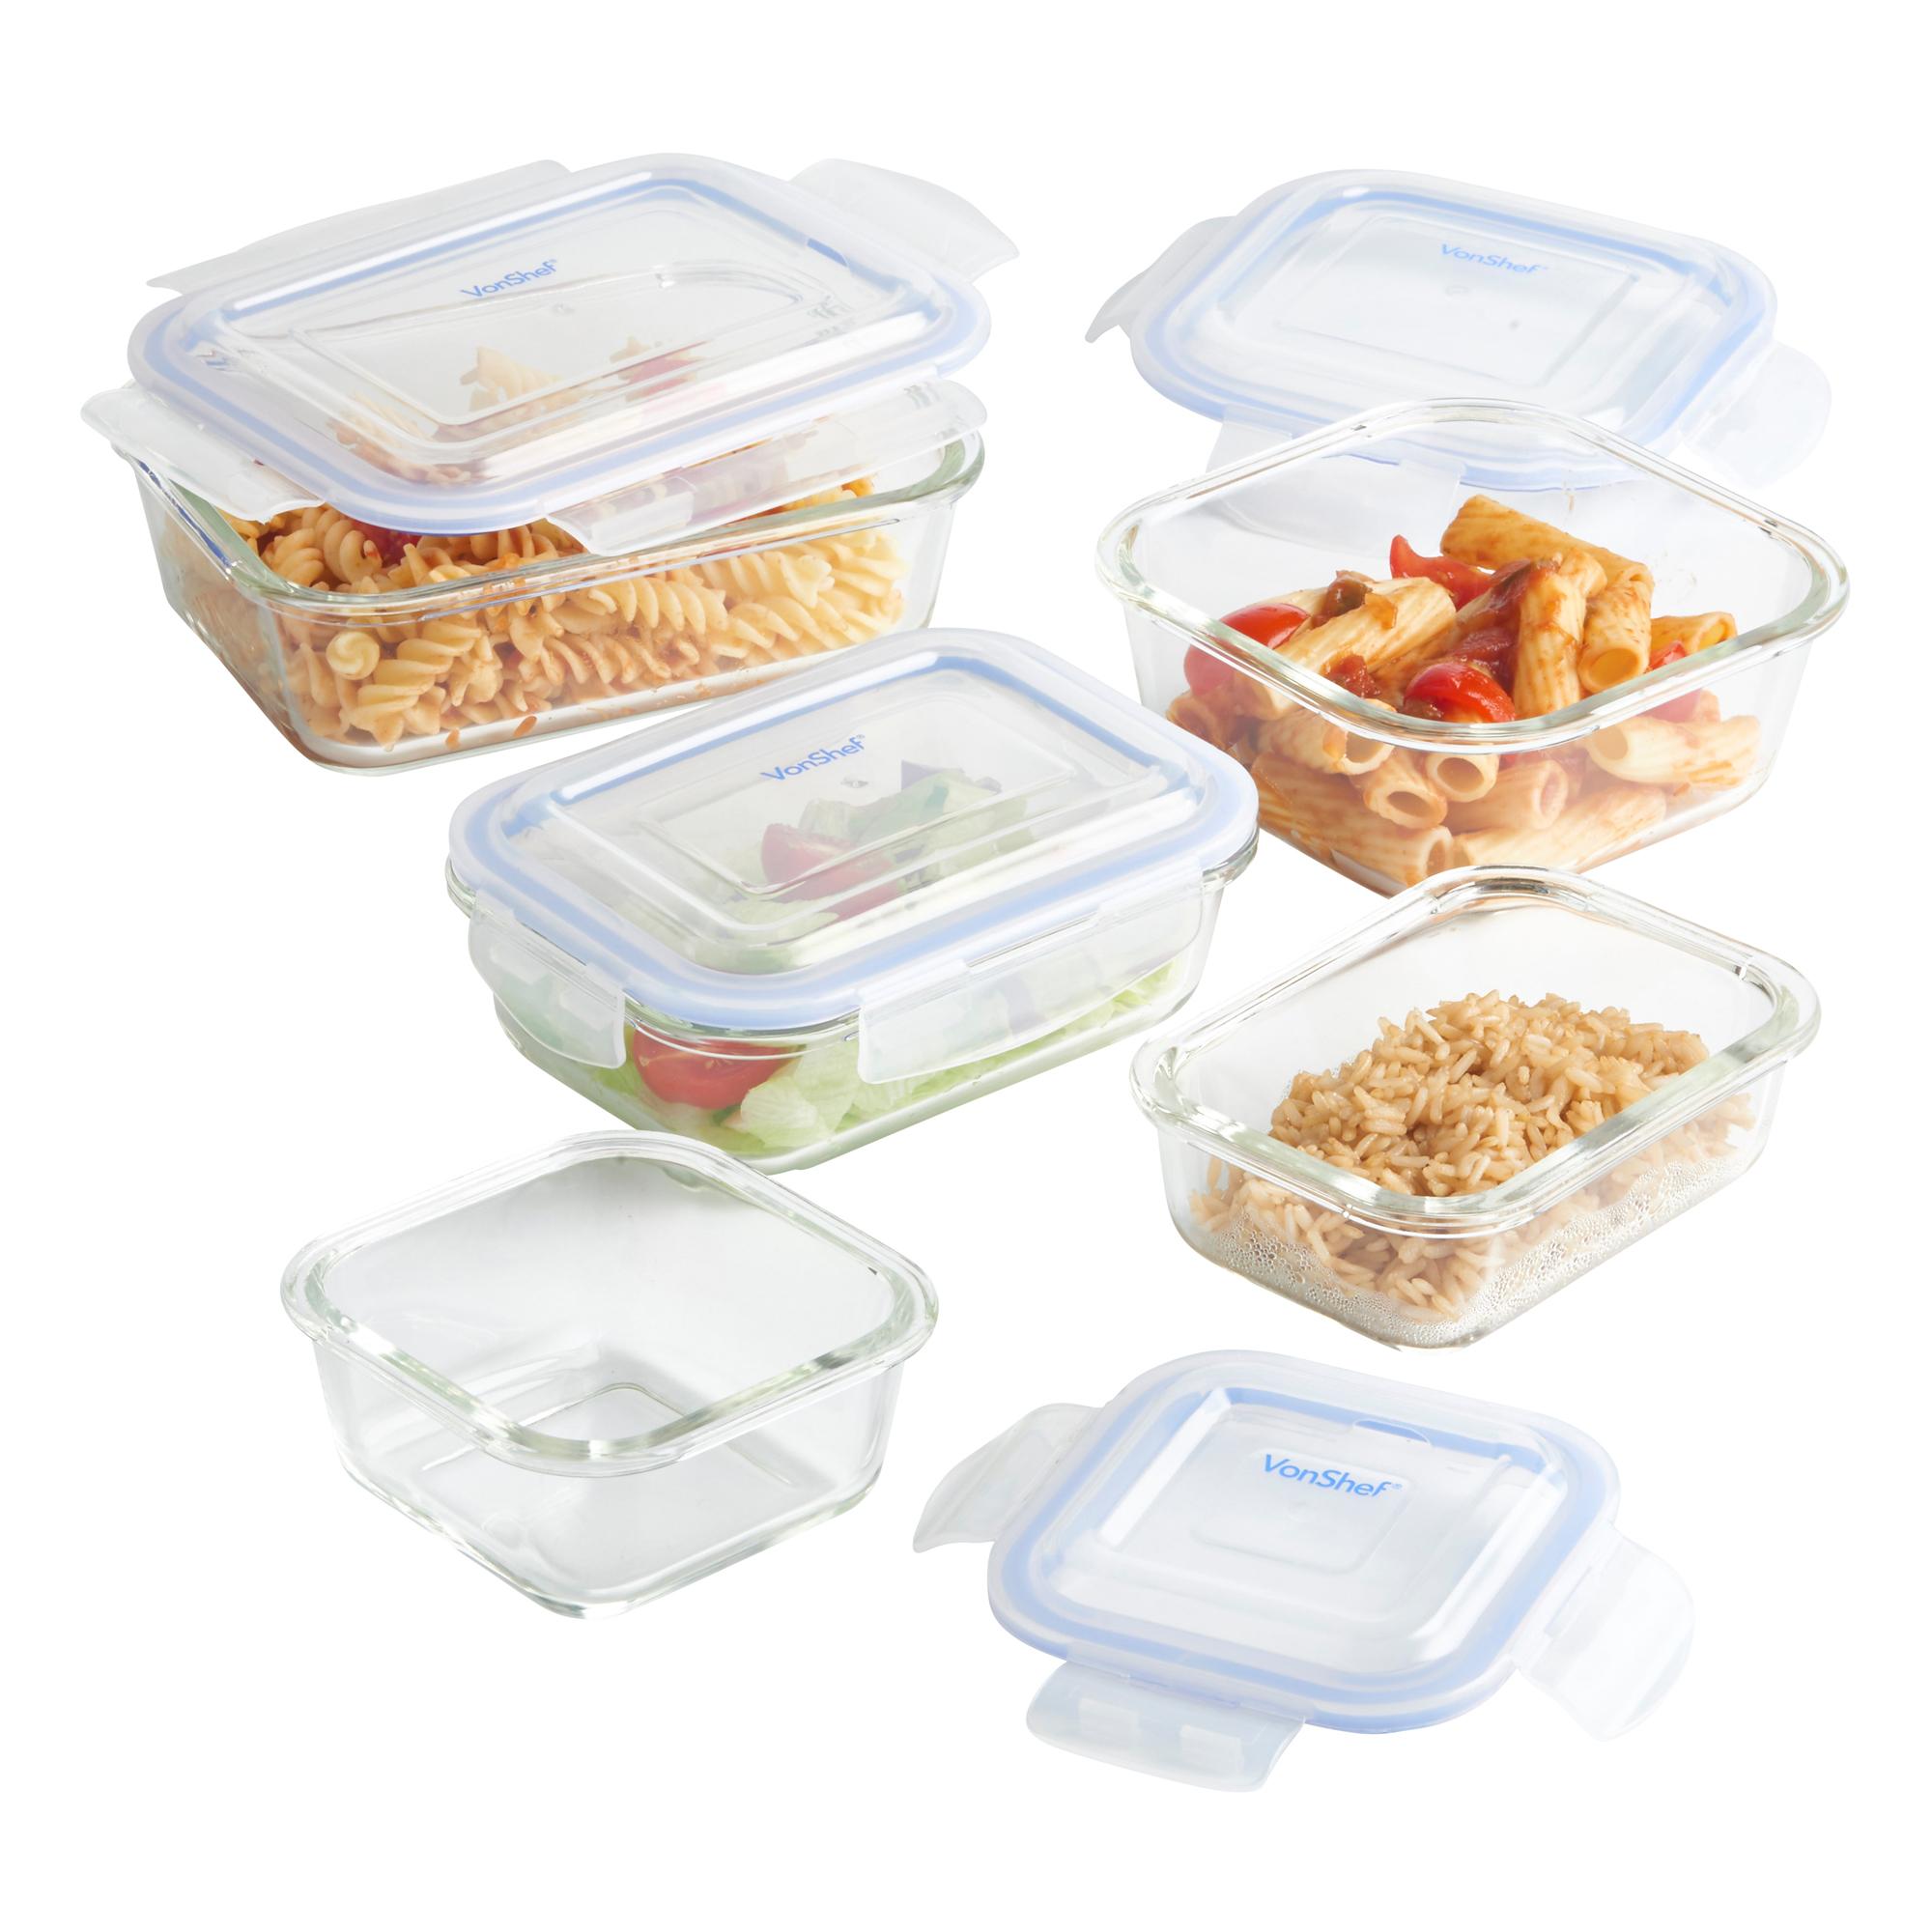 vonshef 5 piece glass container food storage set with lids. Black Bedroom Furniture Sets. Home Design Ideas